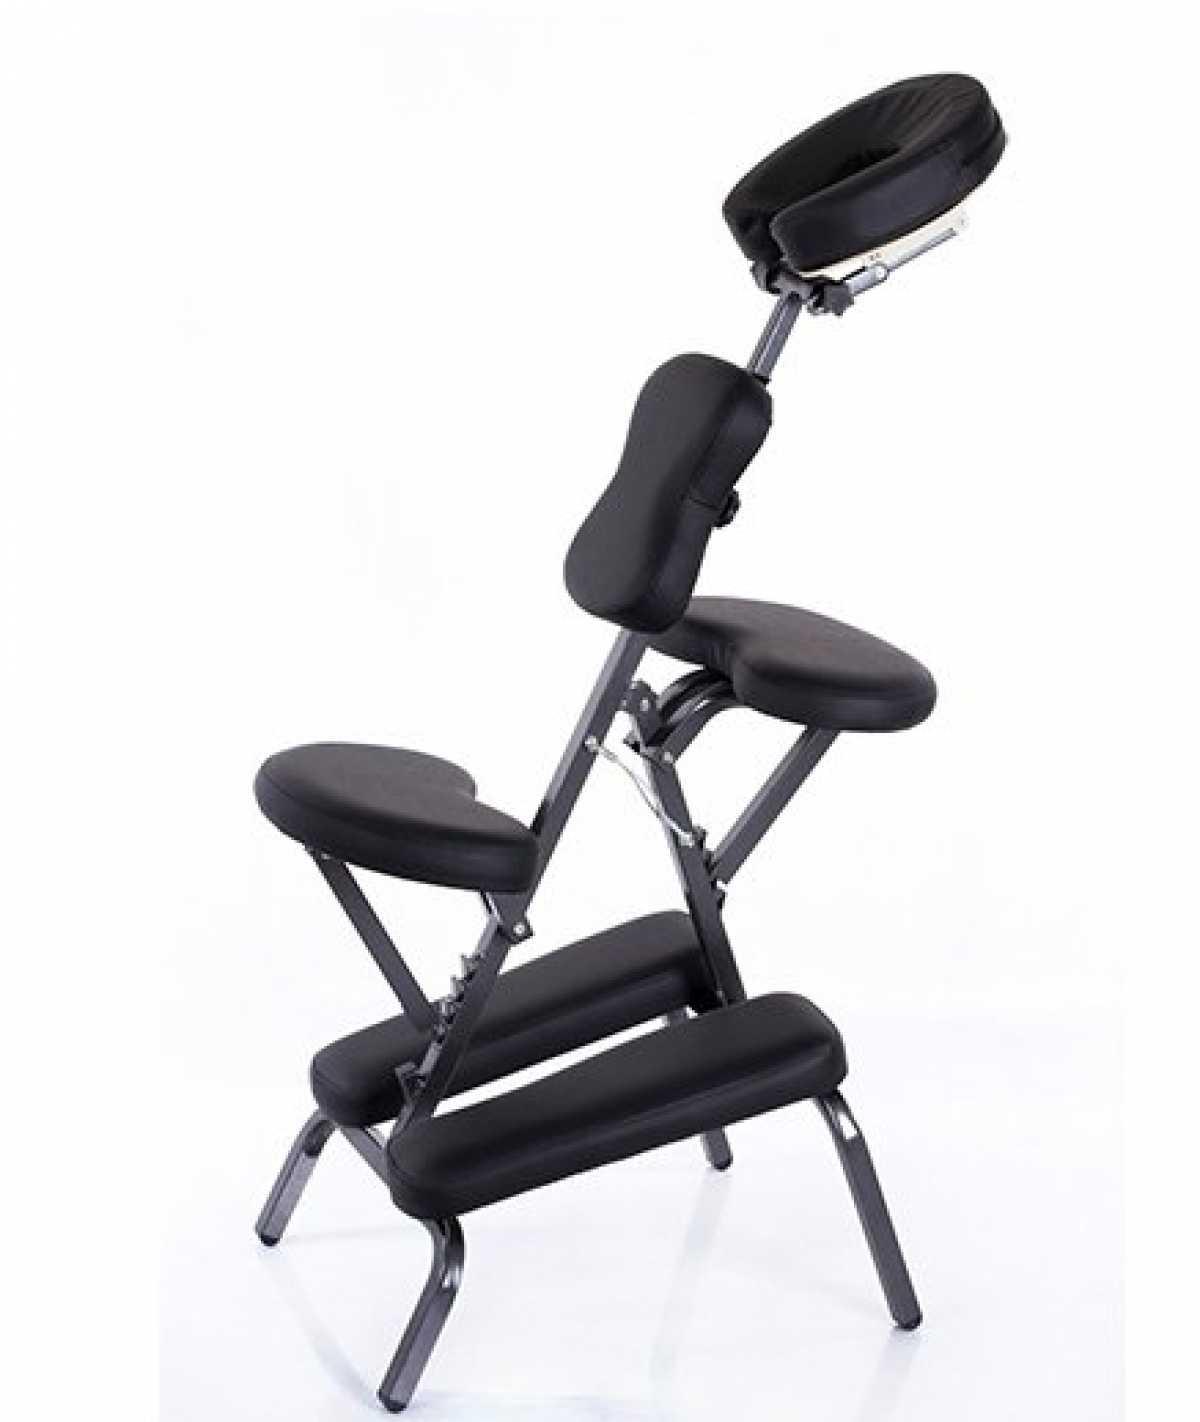 Terapi Sandalyesi, Siyah